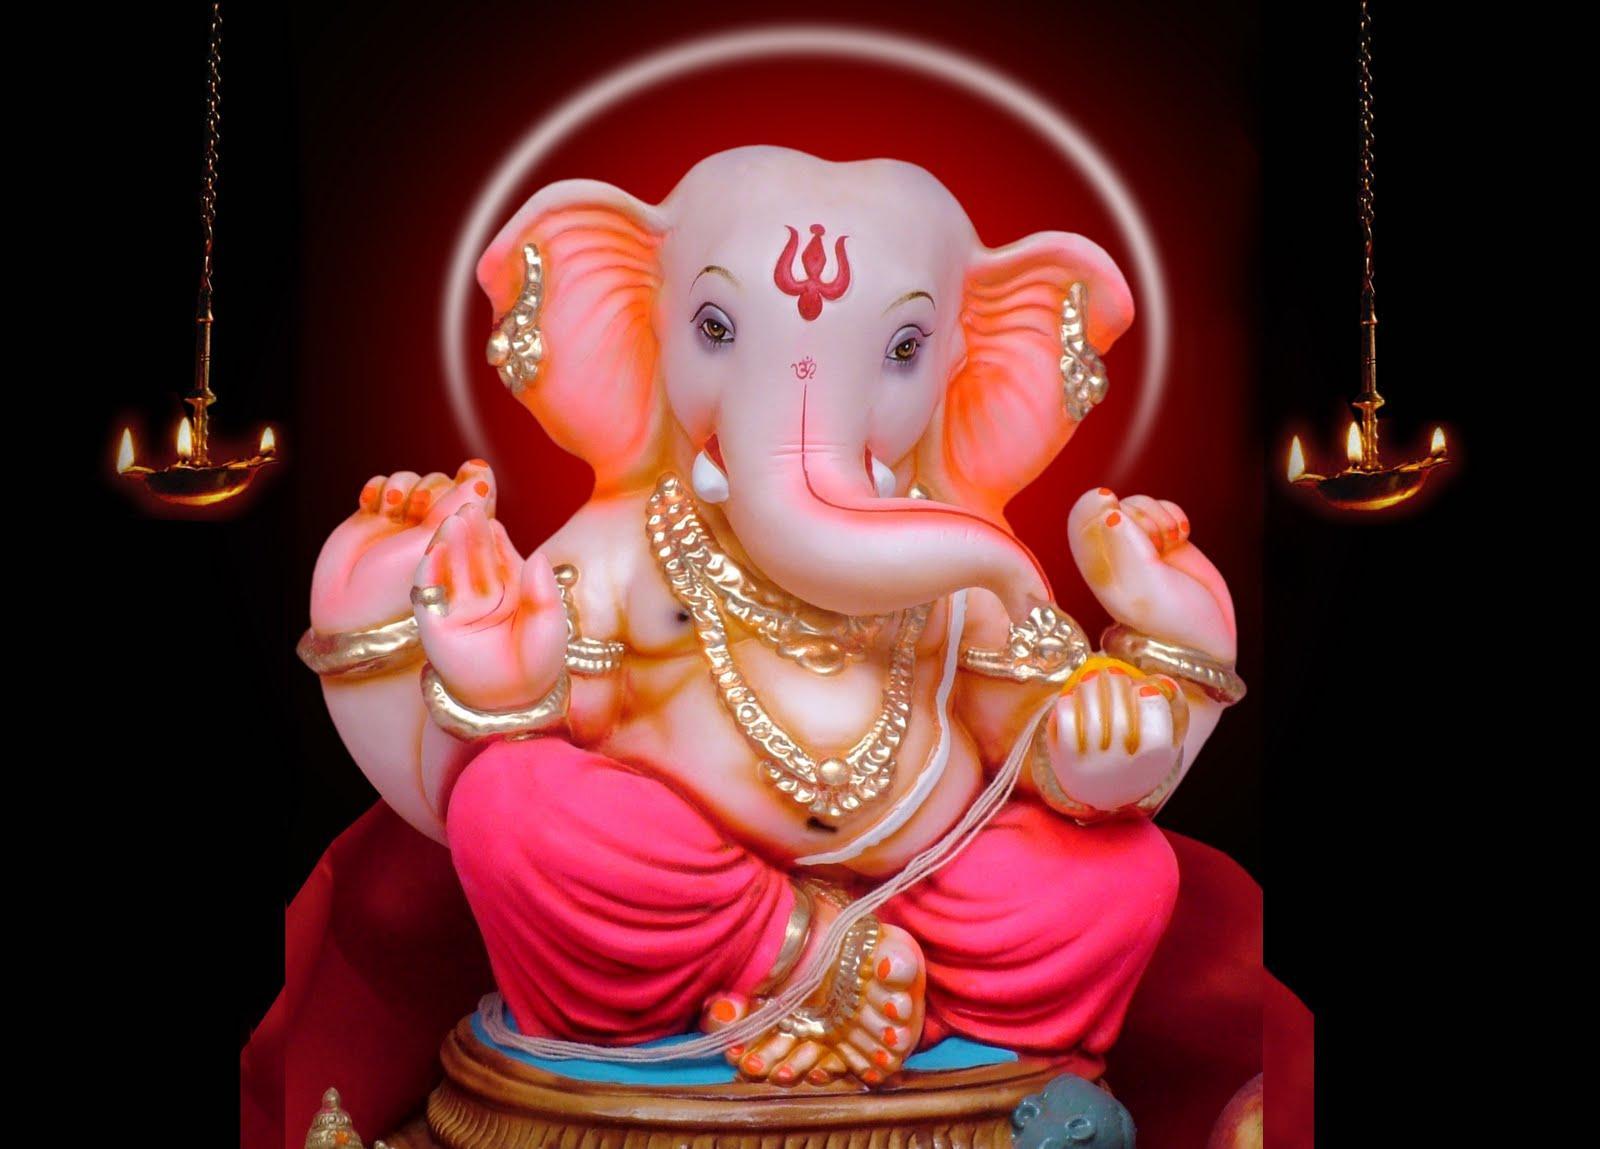 1600x1149 Ganapati Bappa hình nền